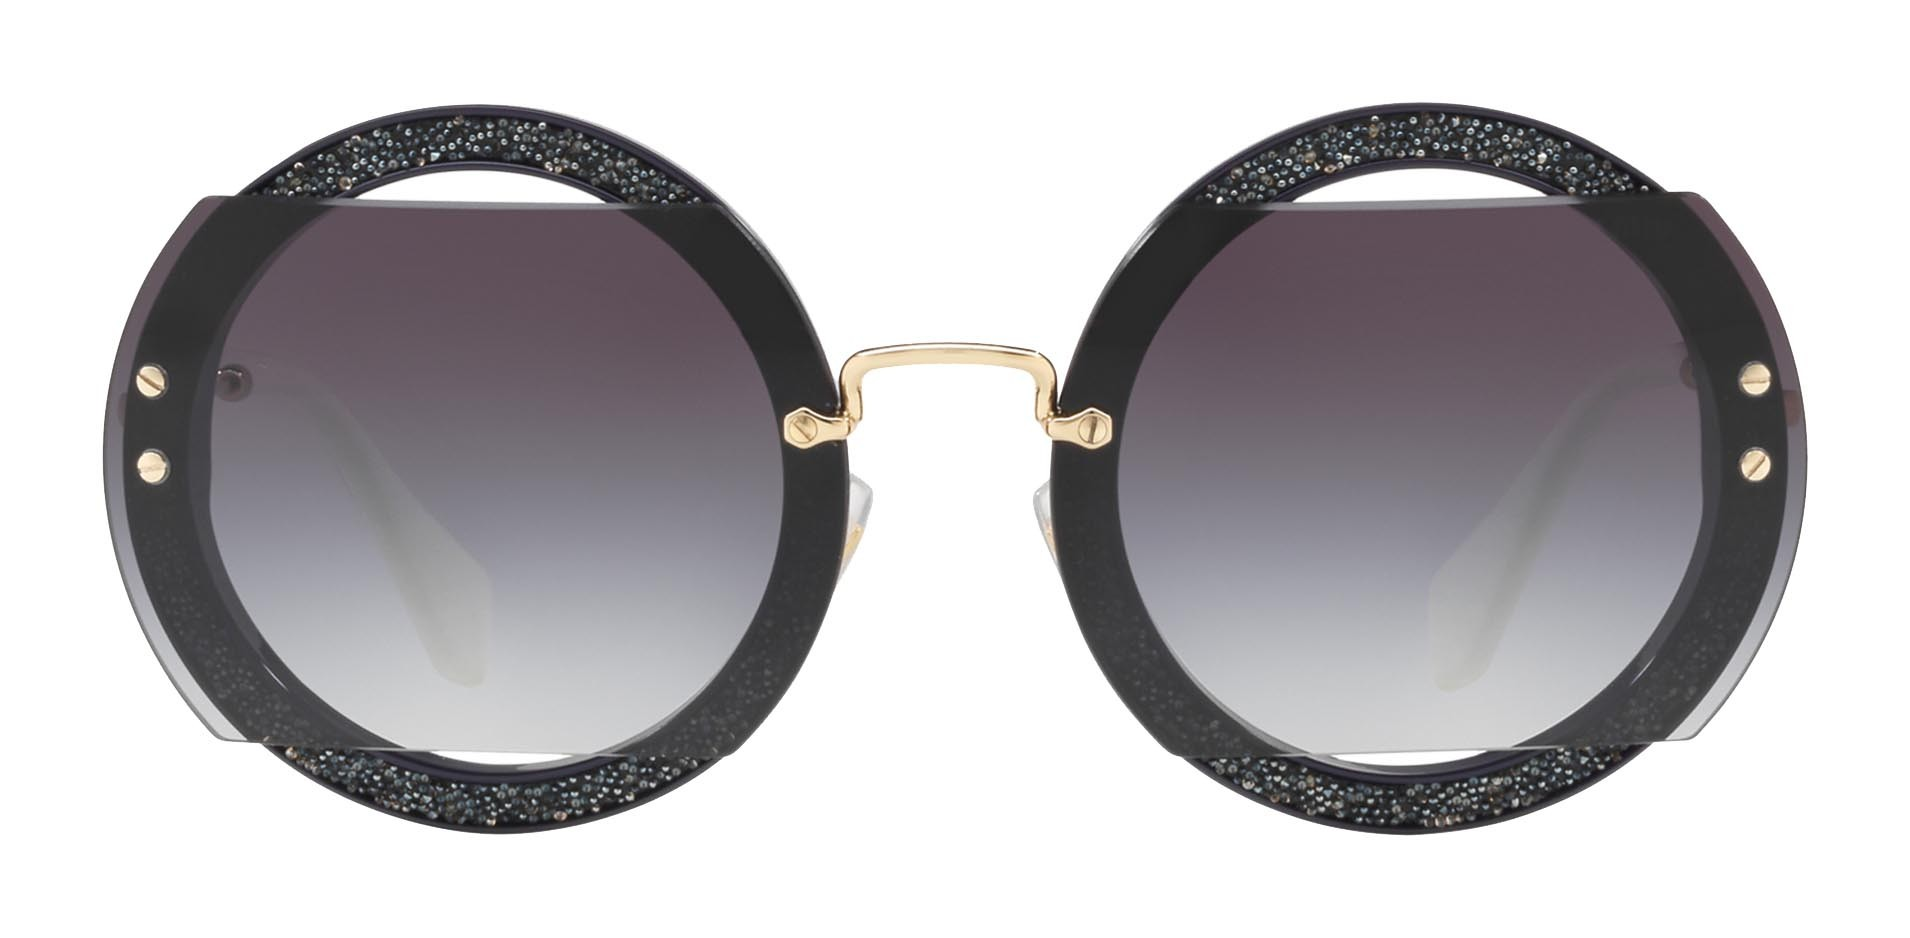 04f4d2498f6 Miu Miu - Miu Miu Reveal with Glitter Sunglasses - Round - Smoke -  Sunglasses - Miu Miu Eyewear